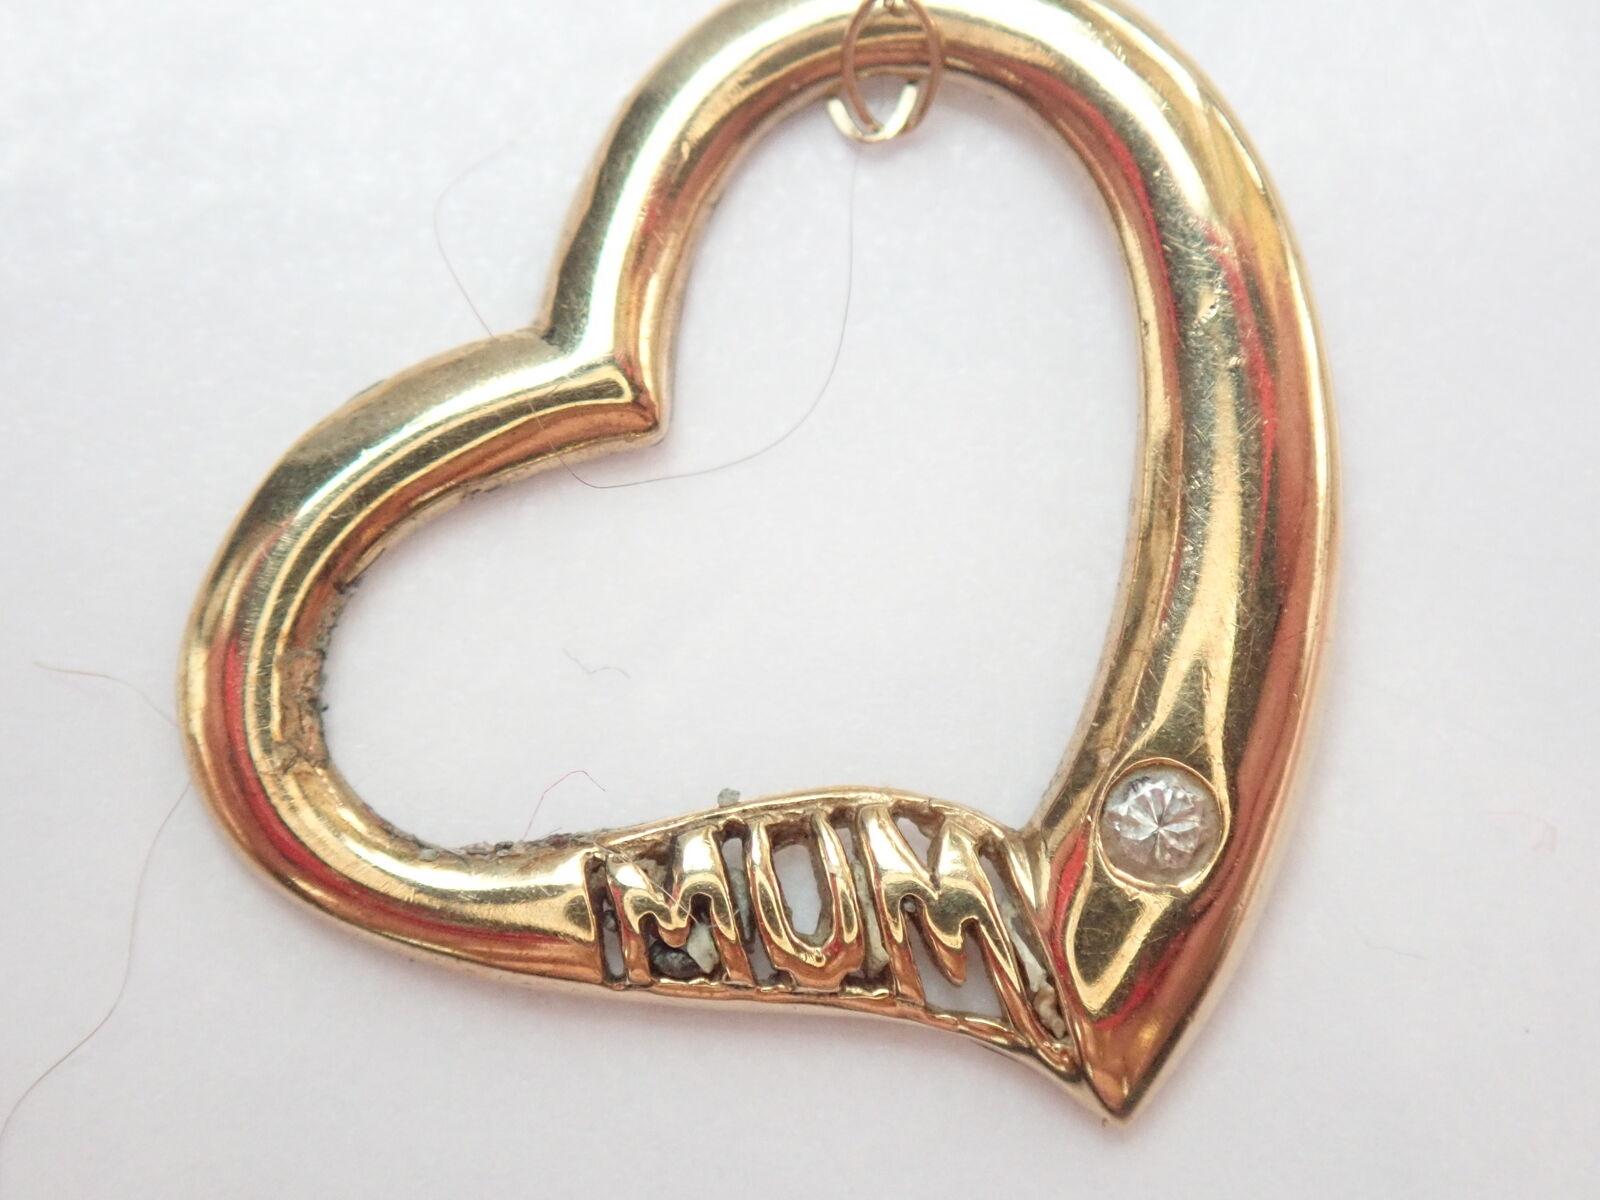 Mum Heart Gold Pendant